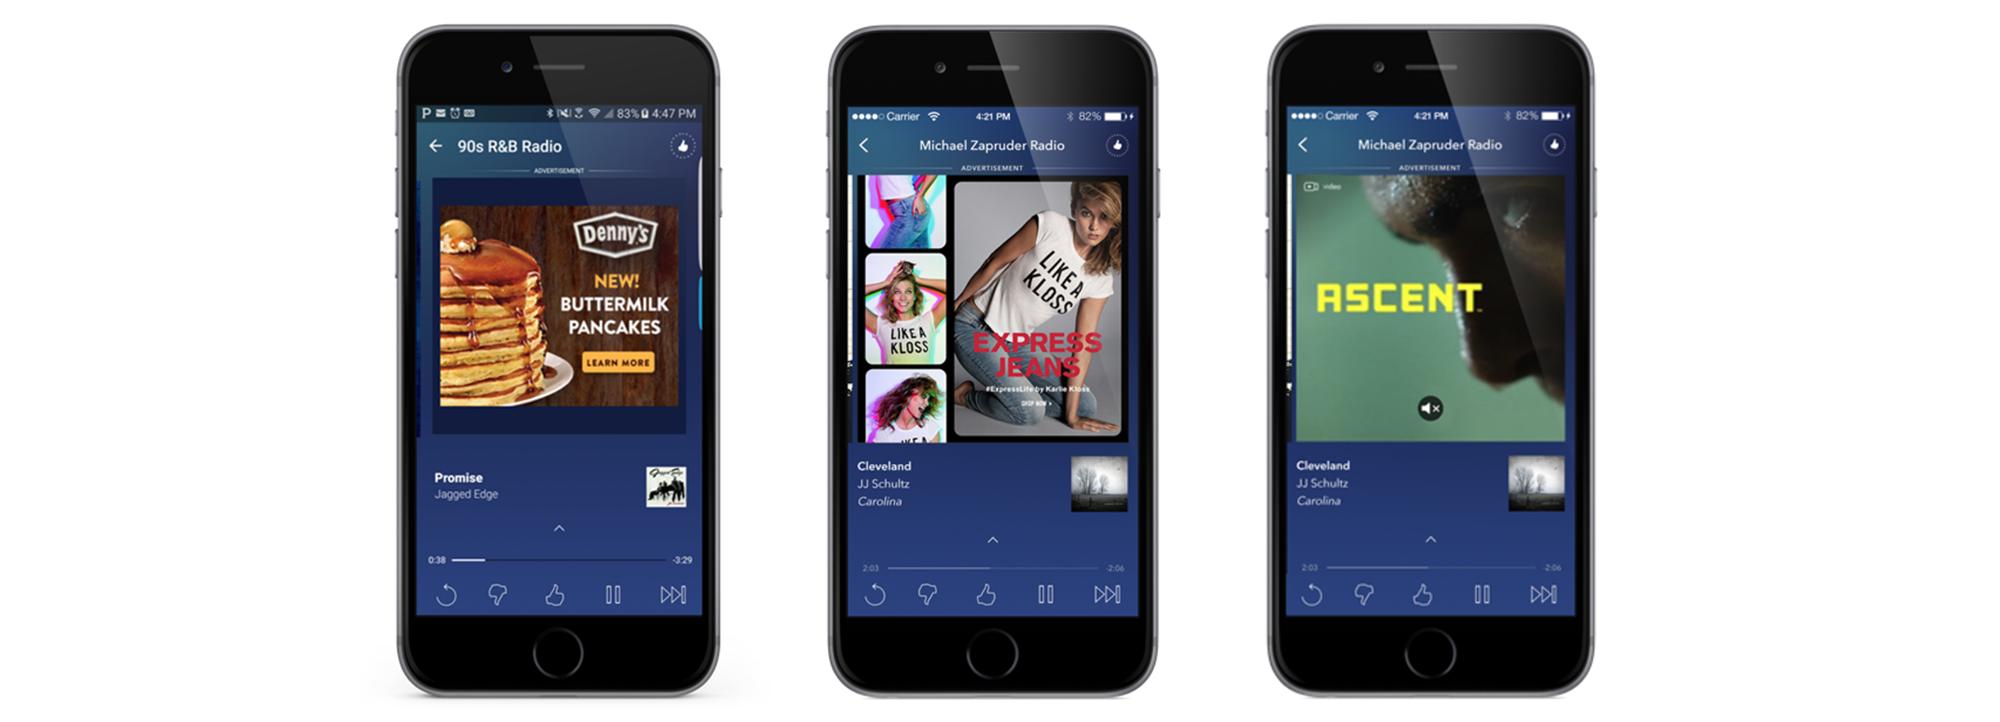 Ads on Pandora mobile phone app.